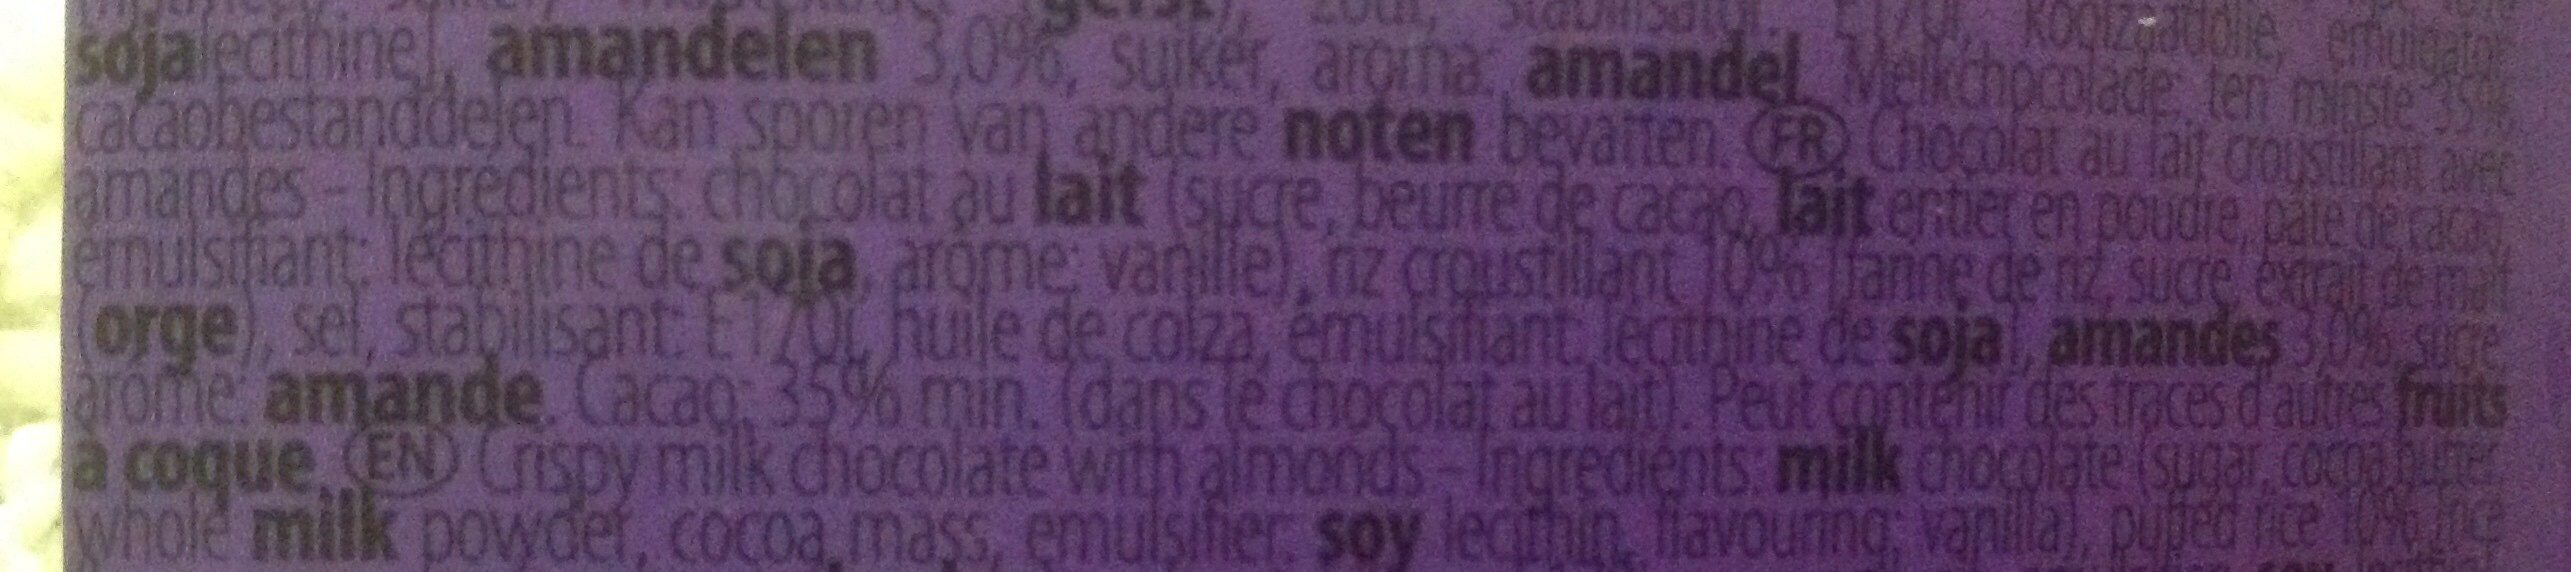 Hamlet Chocola's Crispy Almond 12X125G - Ingrédients - fr